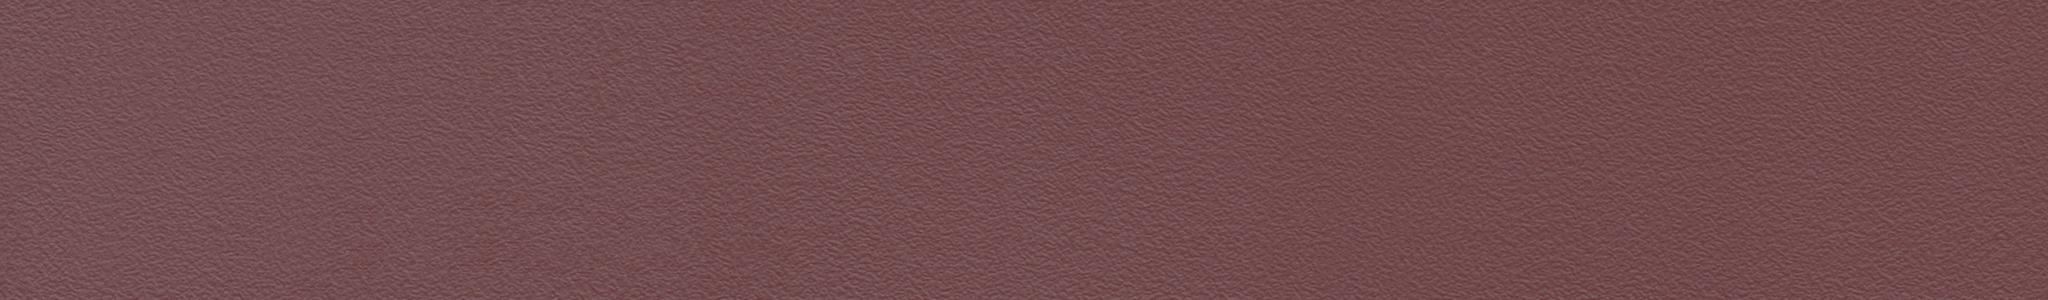 HU 137054 ABS Rouge Bourgogne perle XG